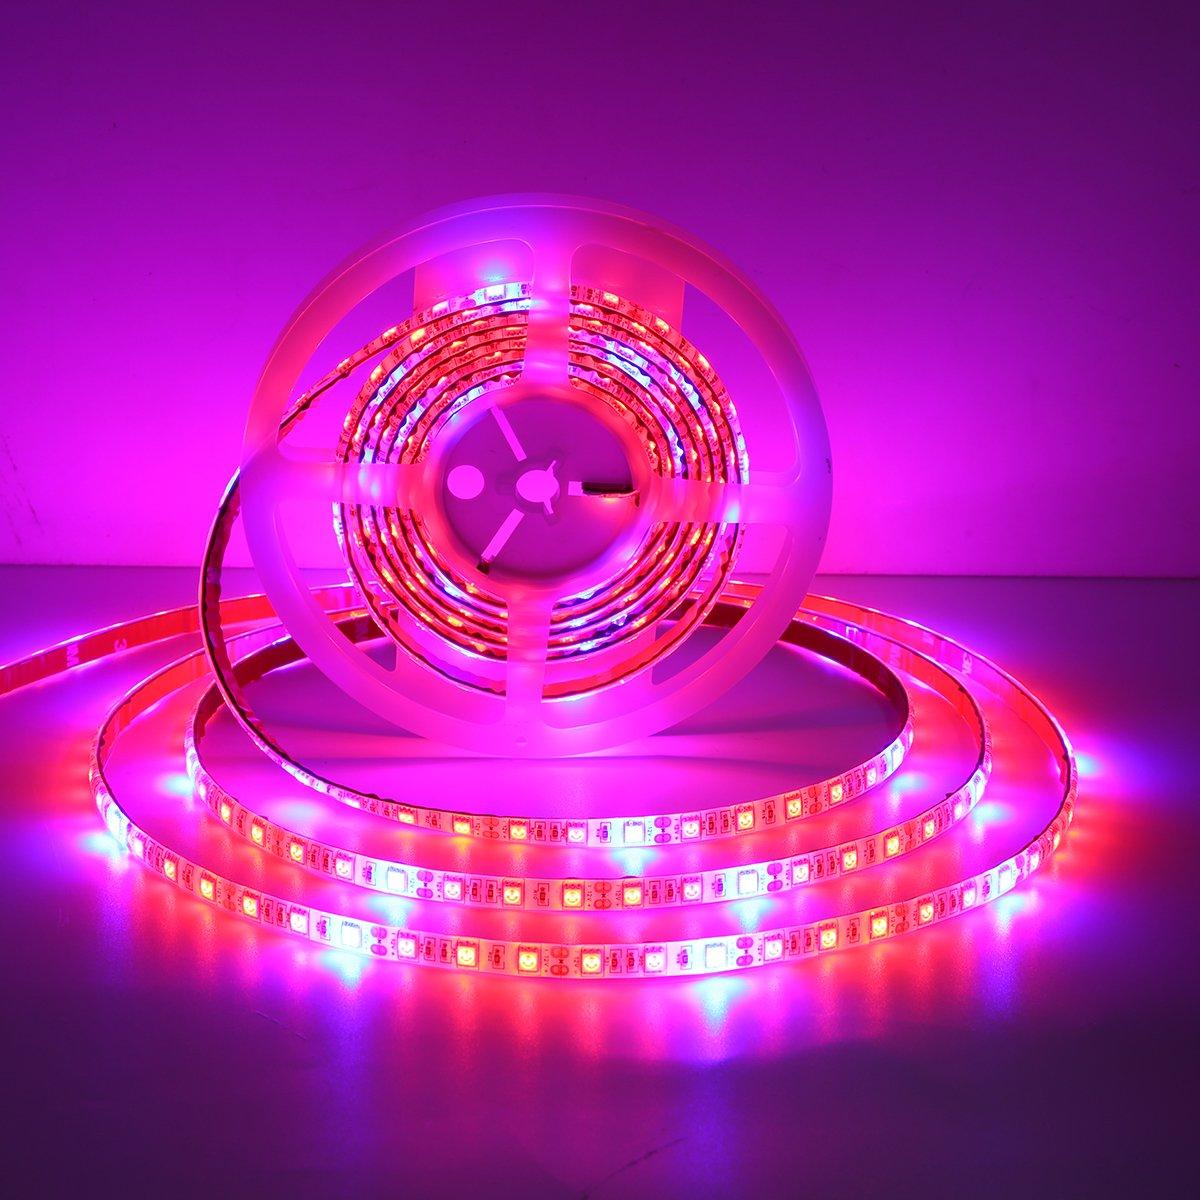 5M SMD5050 Waterproof Full Spectrum LED Plant Grow Strip Light for Greenhouse Aquarium DC12V - (Plug: US Plug)